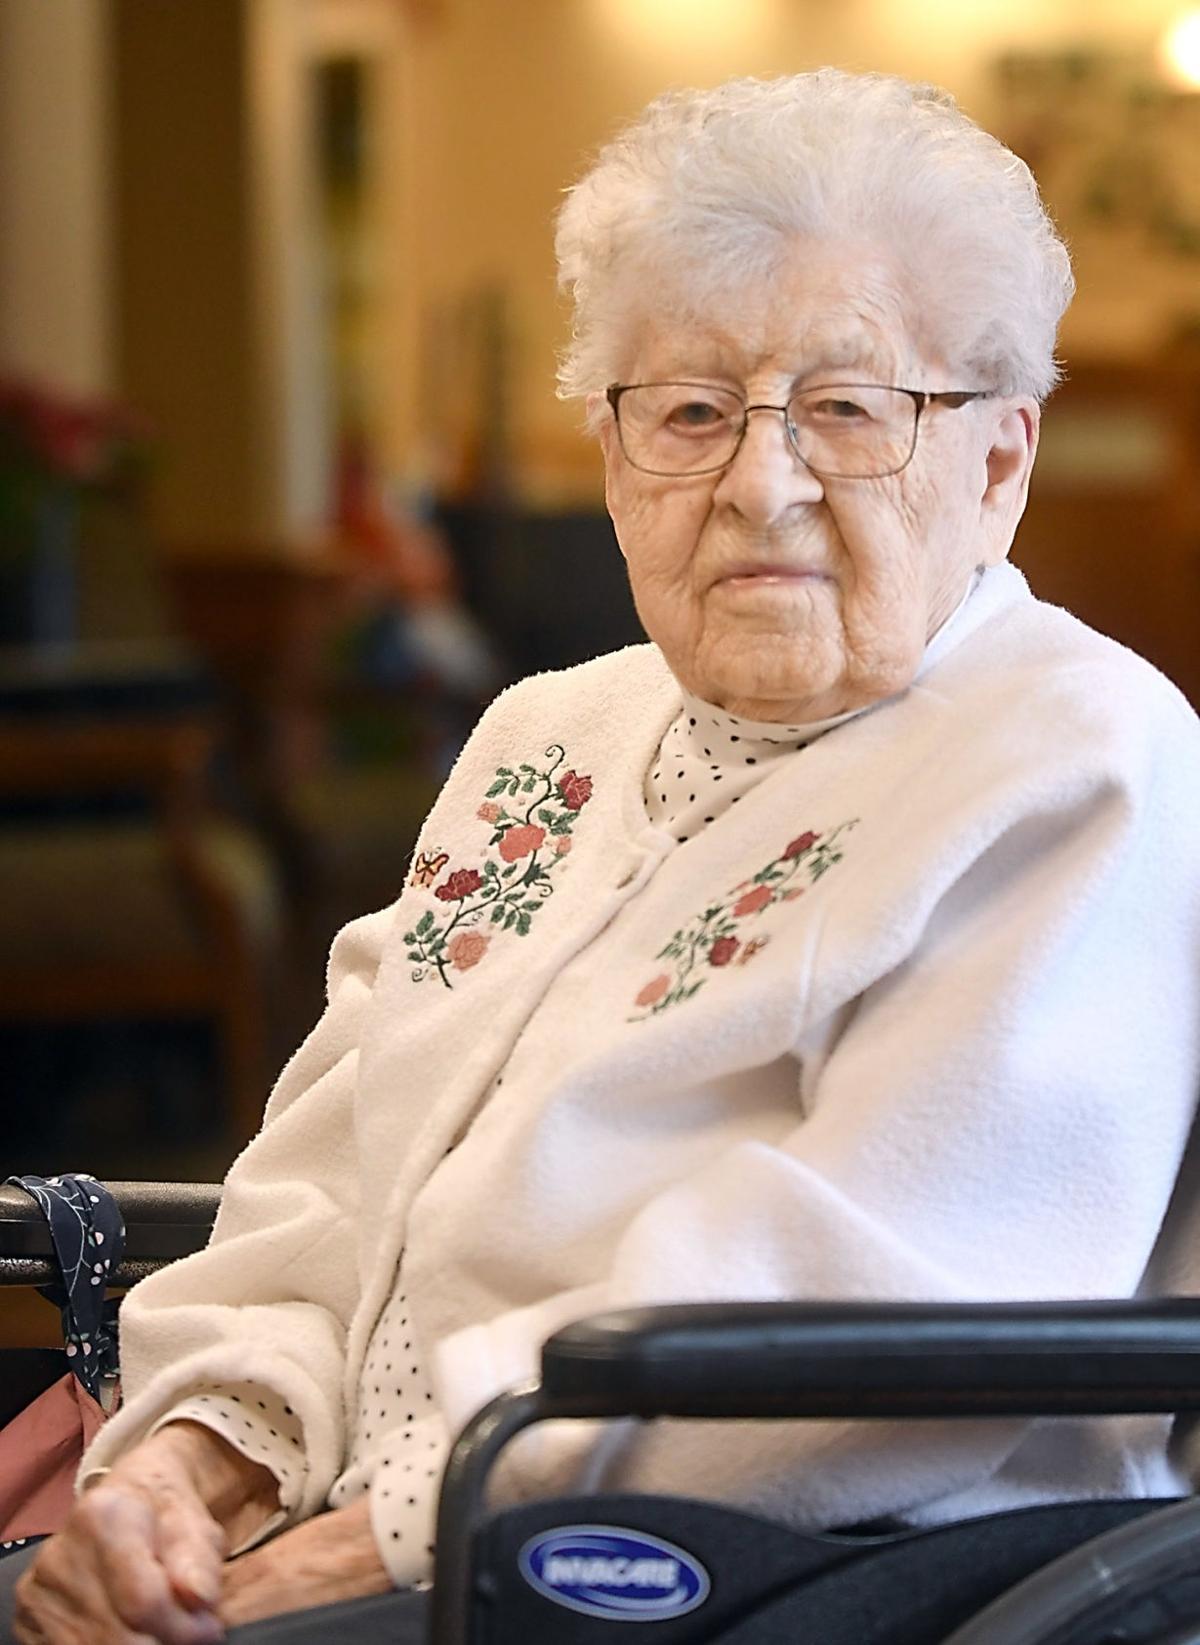 111 Years Of Wisdom New Ulm Woman Believed To Be Oldest Minnesota Resident Local News Mankatofreepress Com